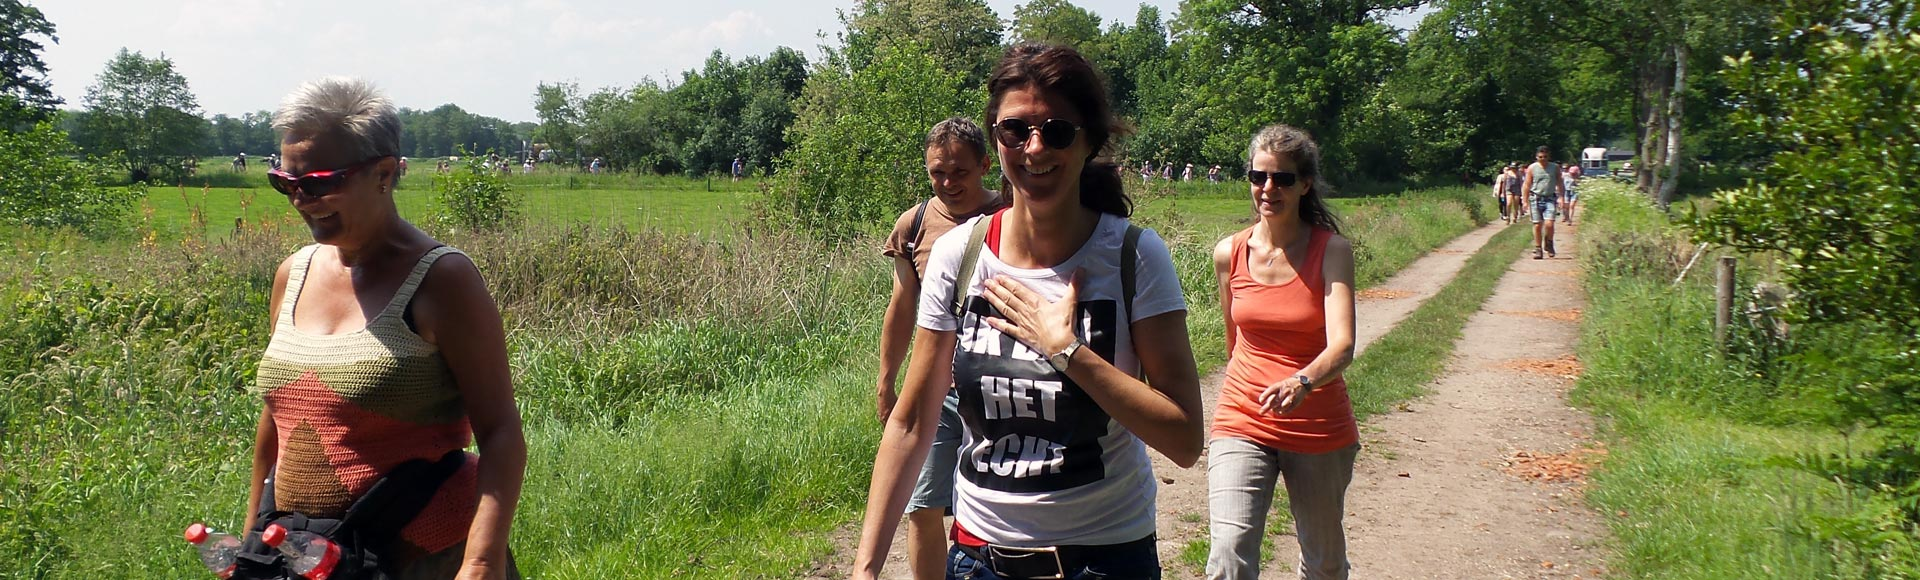 veluwe-wandeltocht_slide01